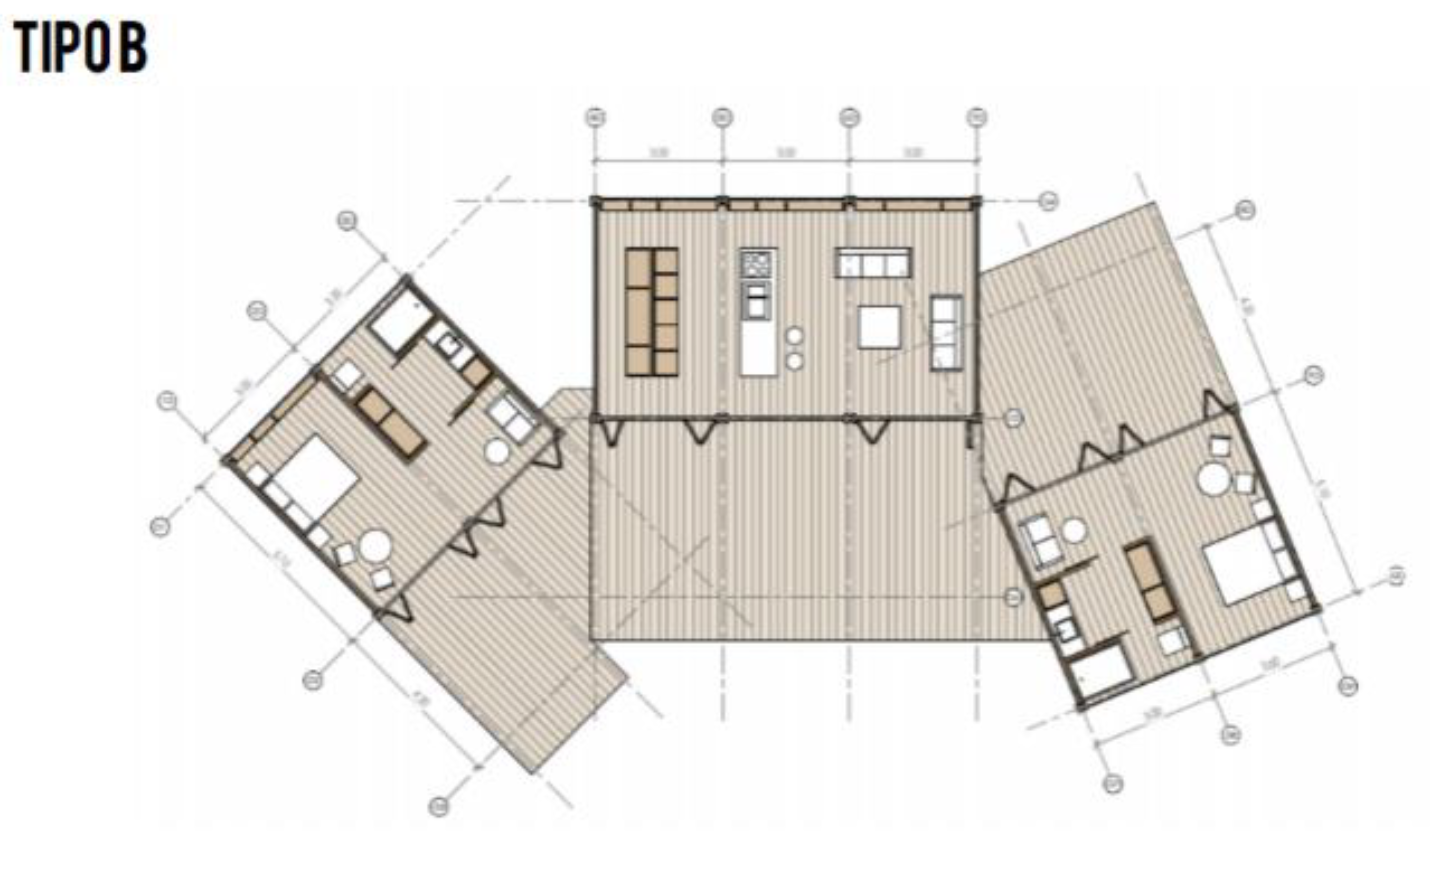 talanquera-floor-plan-b-150m2